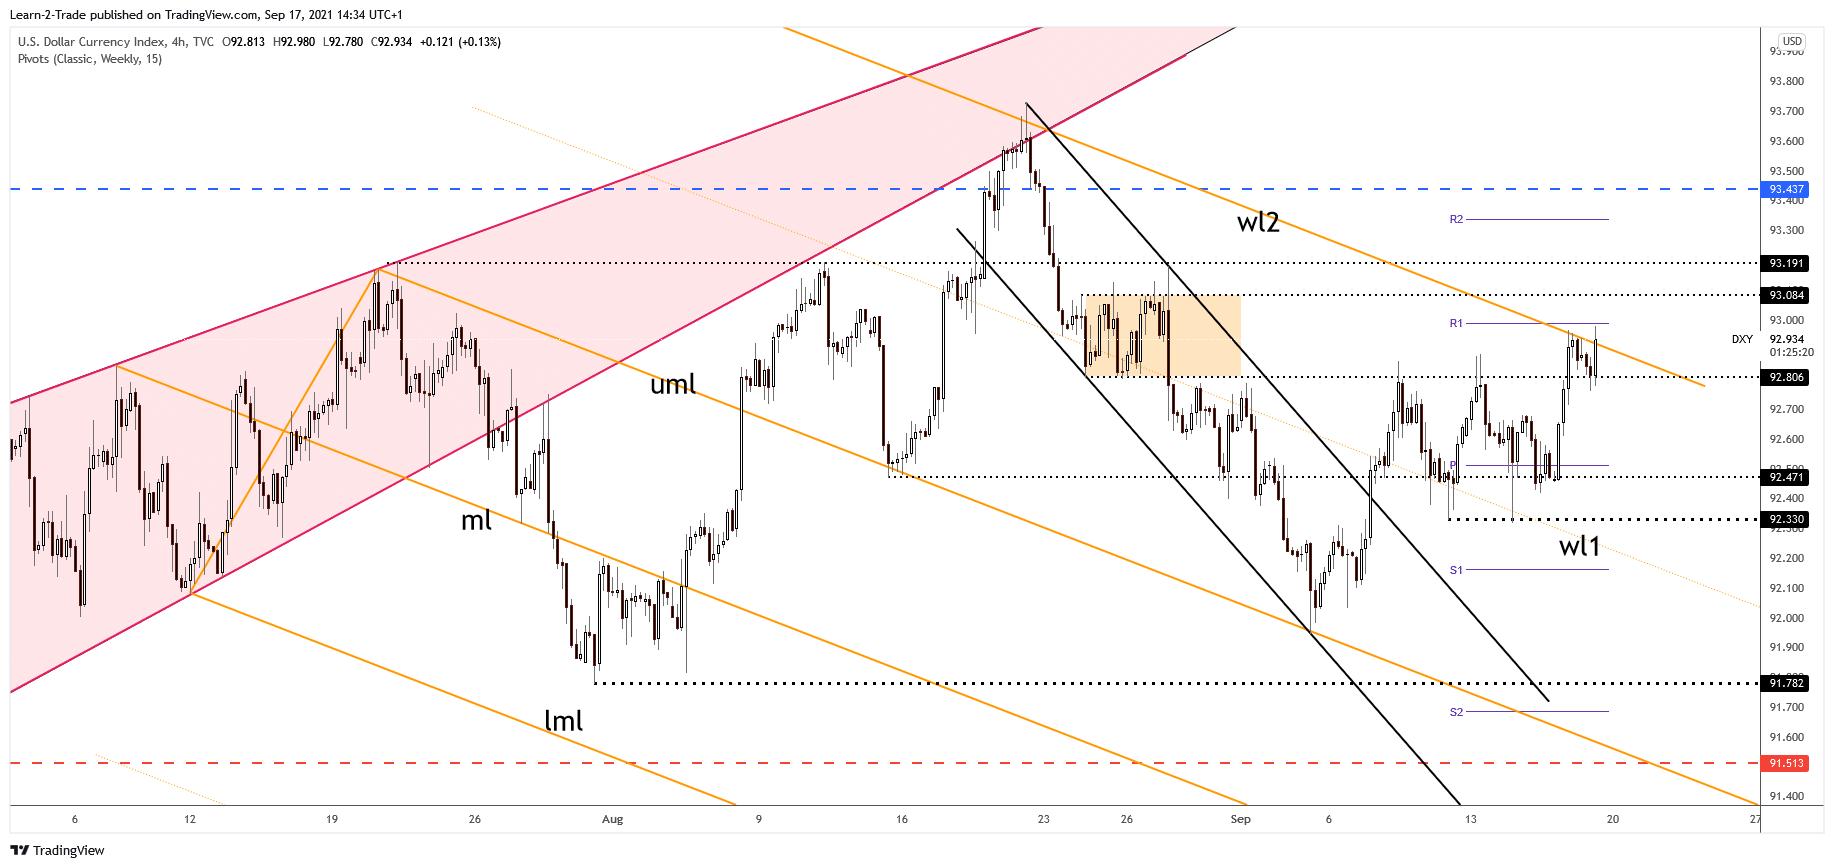 Dollar Index 4-hour price chart